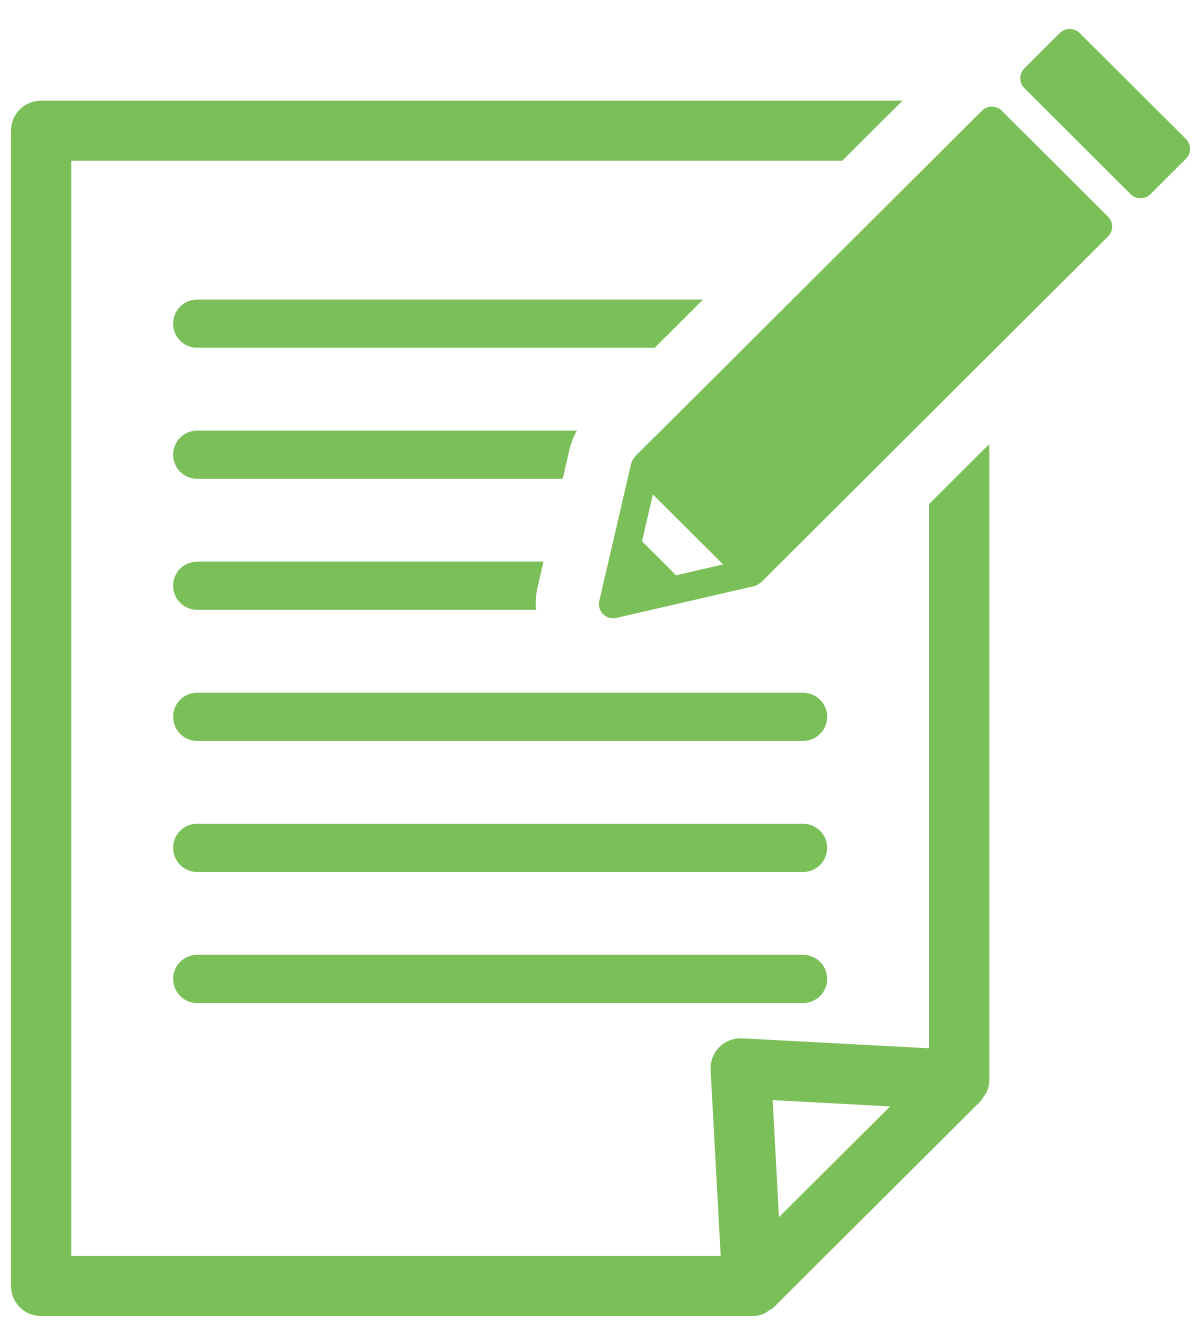 INDIの評価・審査・各種証明書〜法令基準に基づいて評価・チェックします!